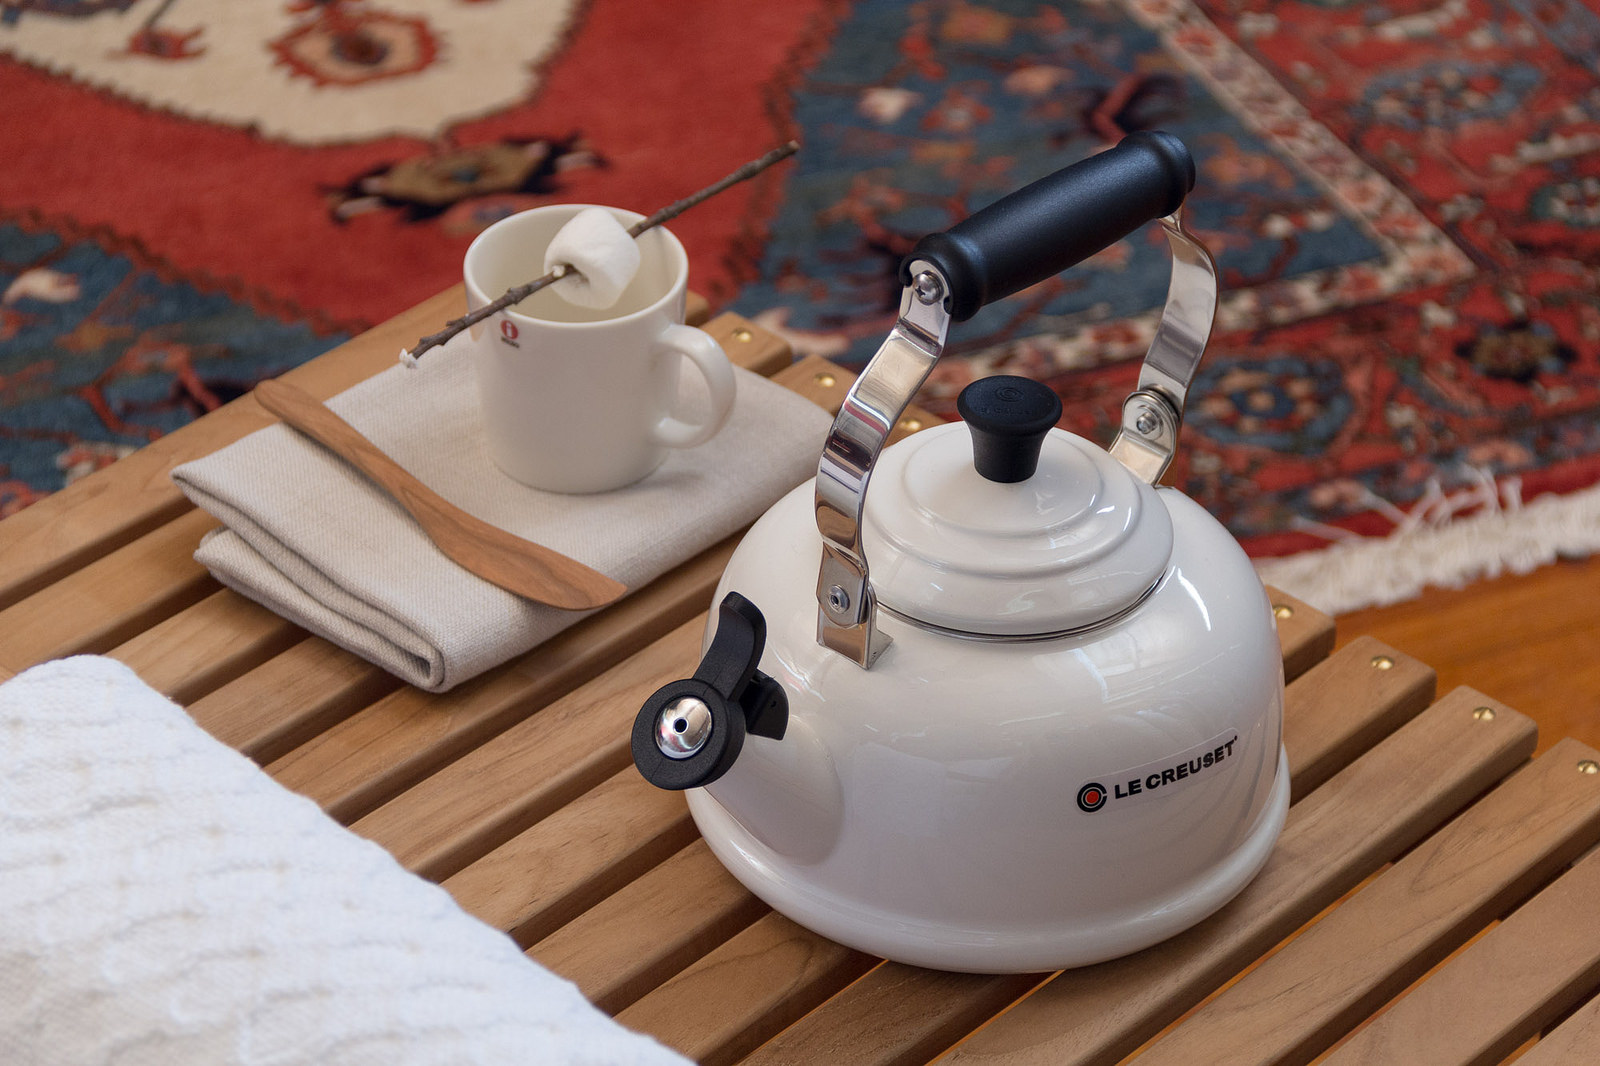 Le Creuset Whistling kettle ,  iittala Teema  Mug,  Jonathan's spoons wooden spreader